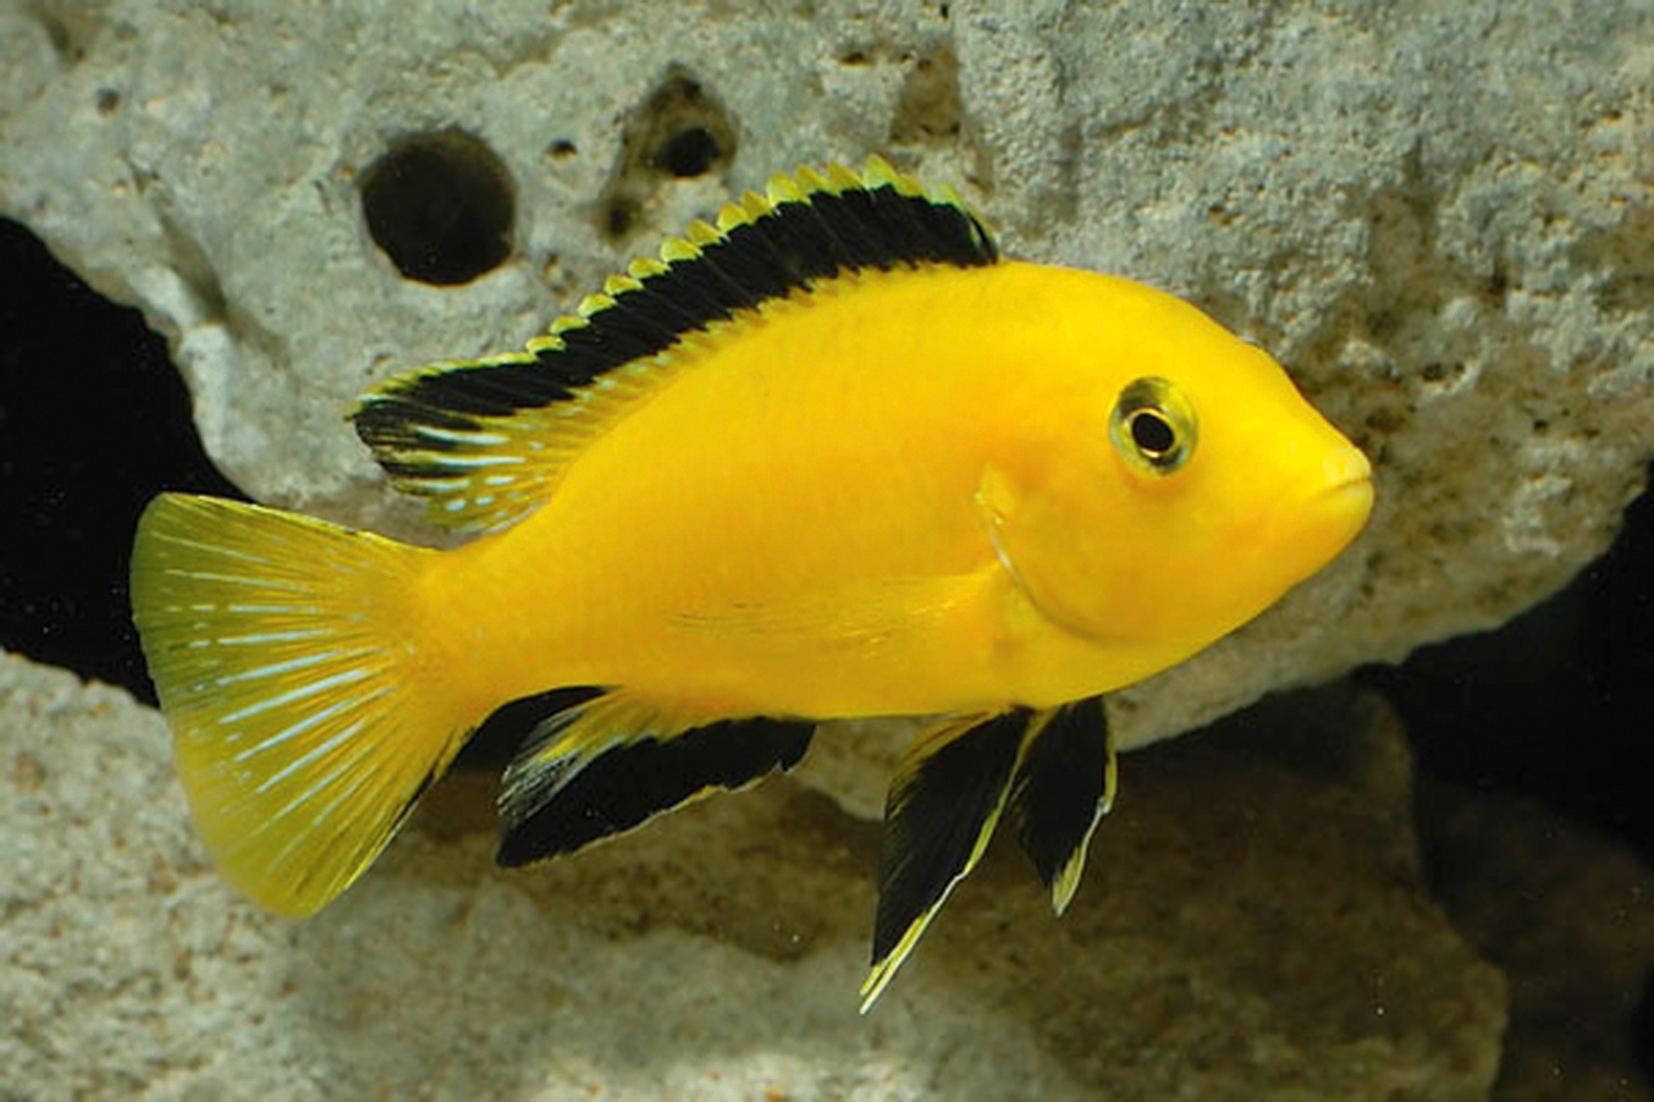 yellow cichlid fish - photo #5